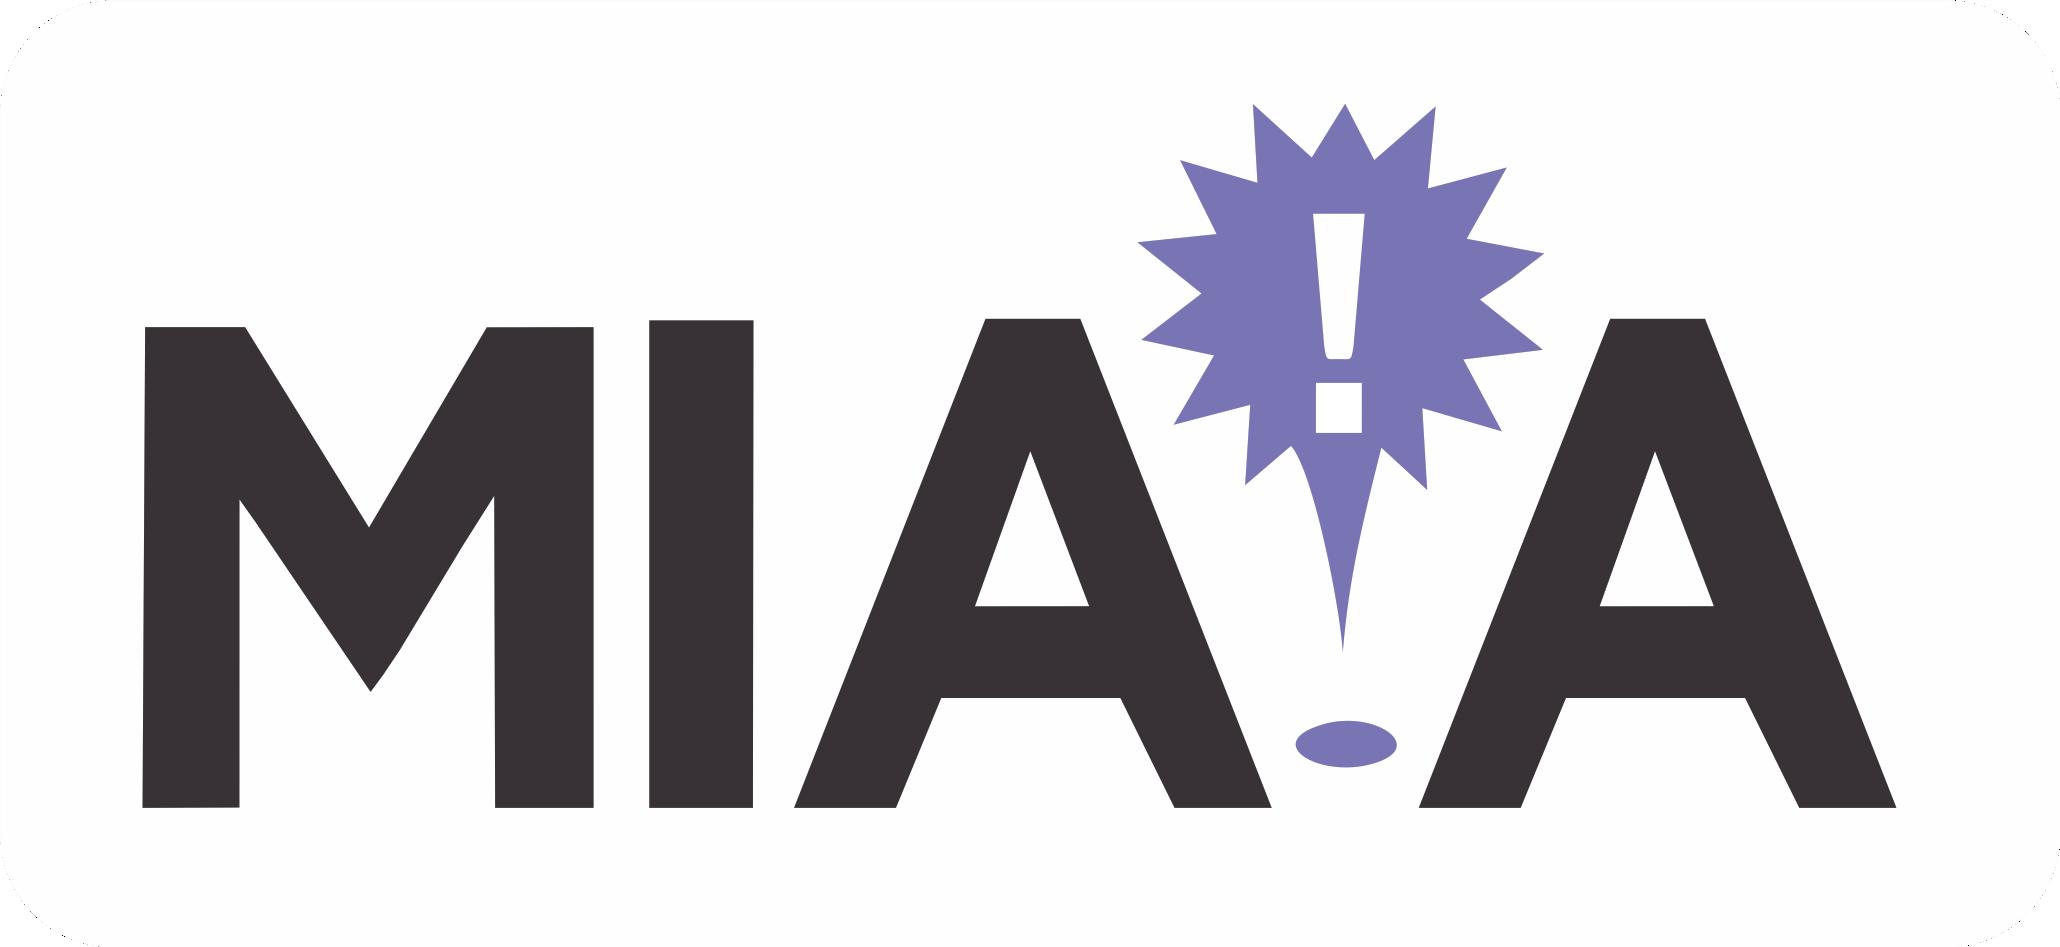 M.I.A.A. Santa Fe